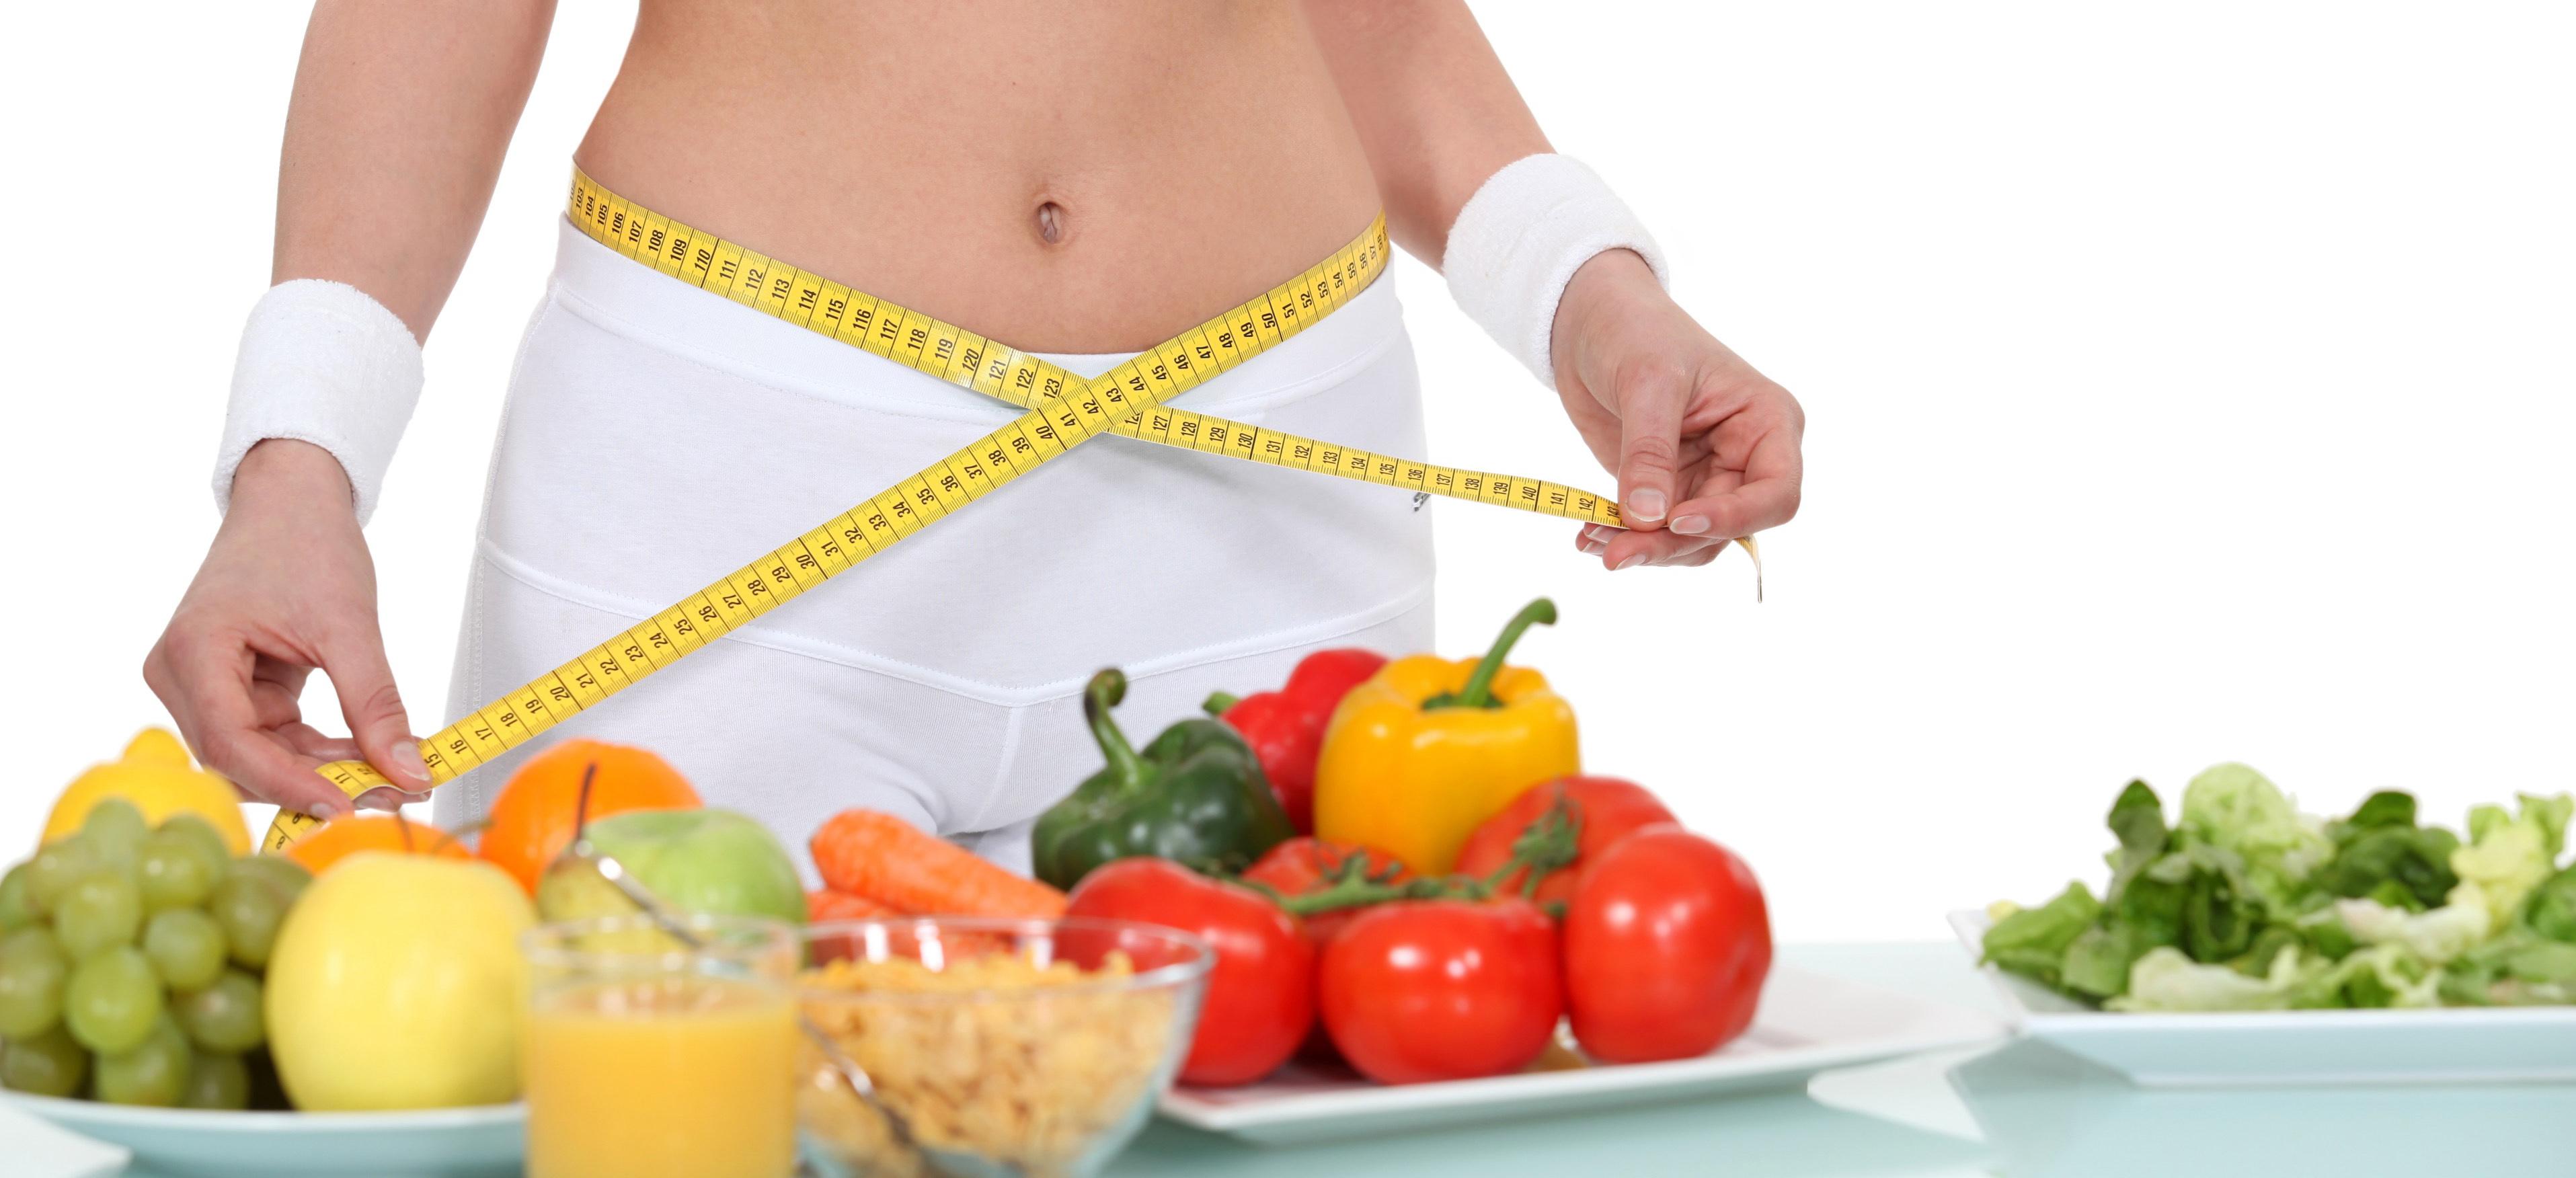 Piani nutrizionali mirati